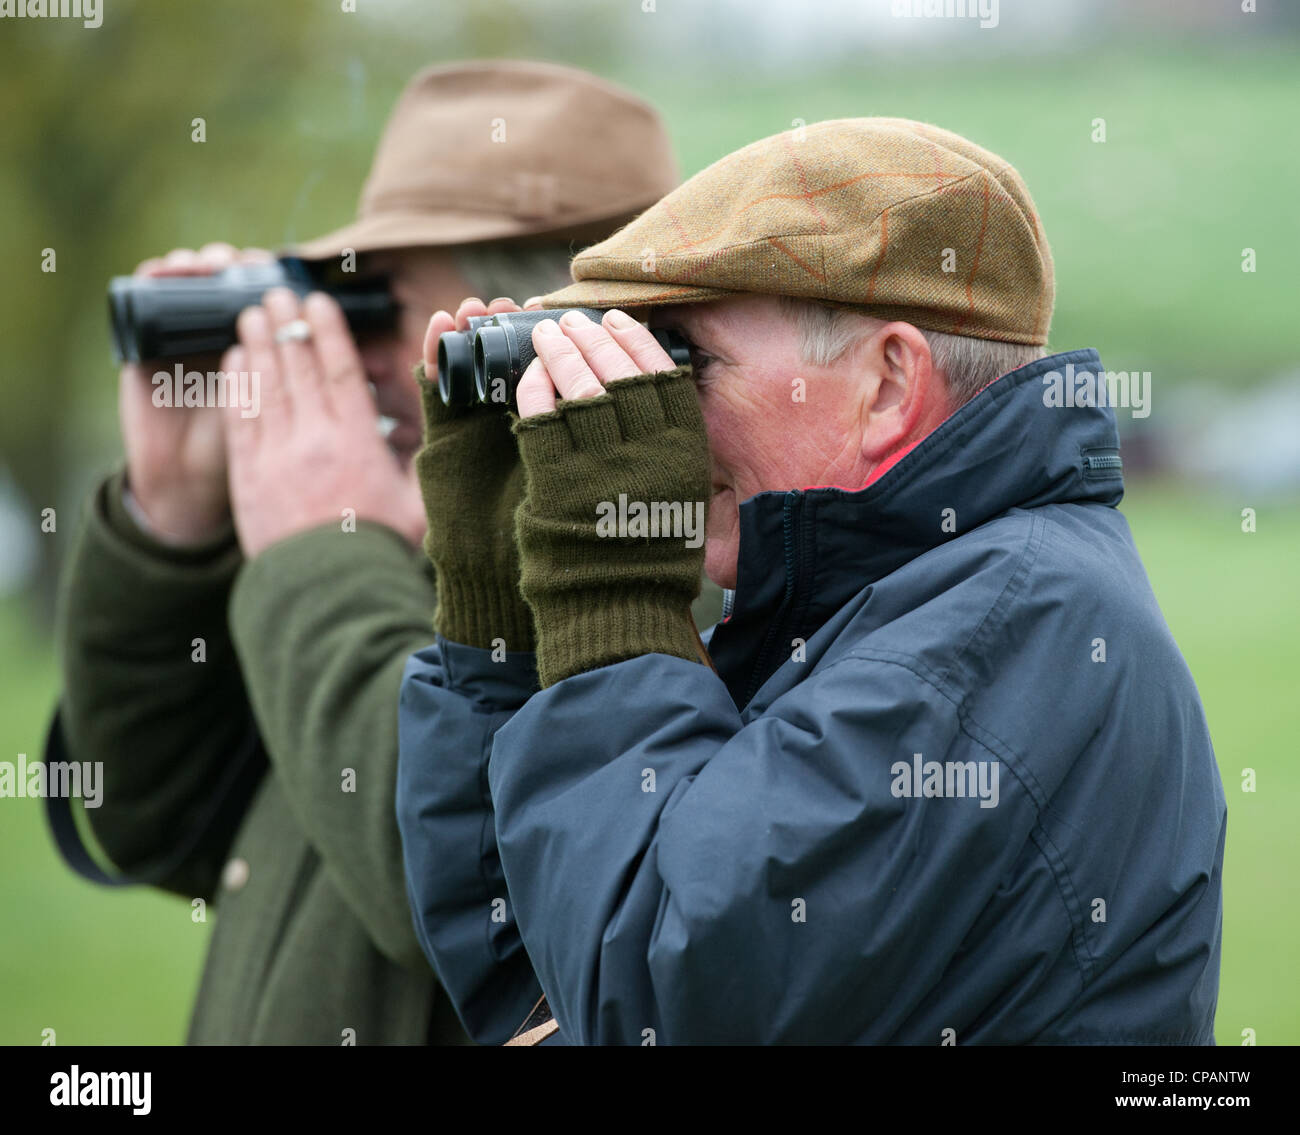 Watching horse racing with Binoculars - Stock Image